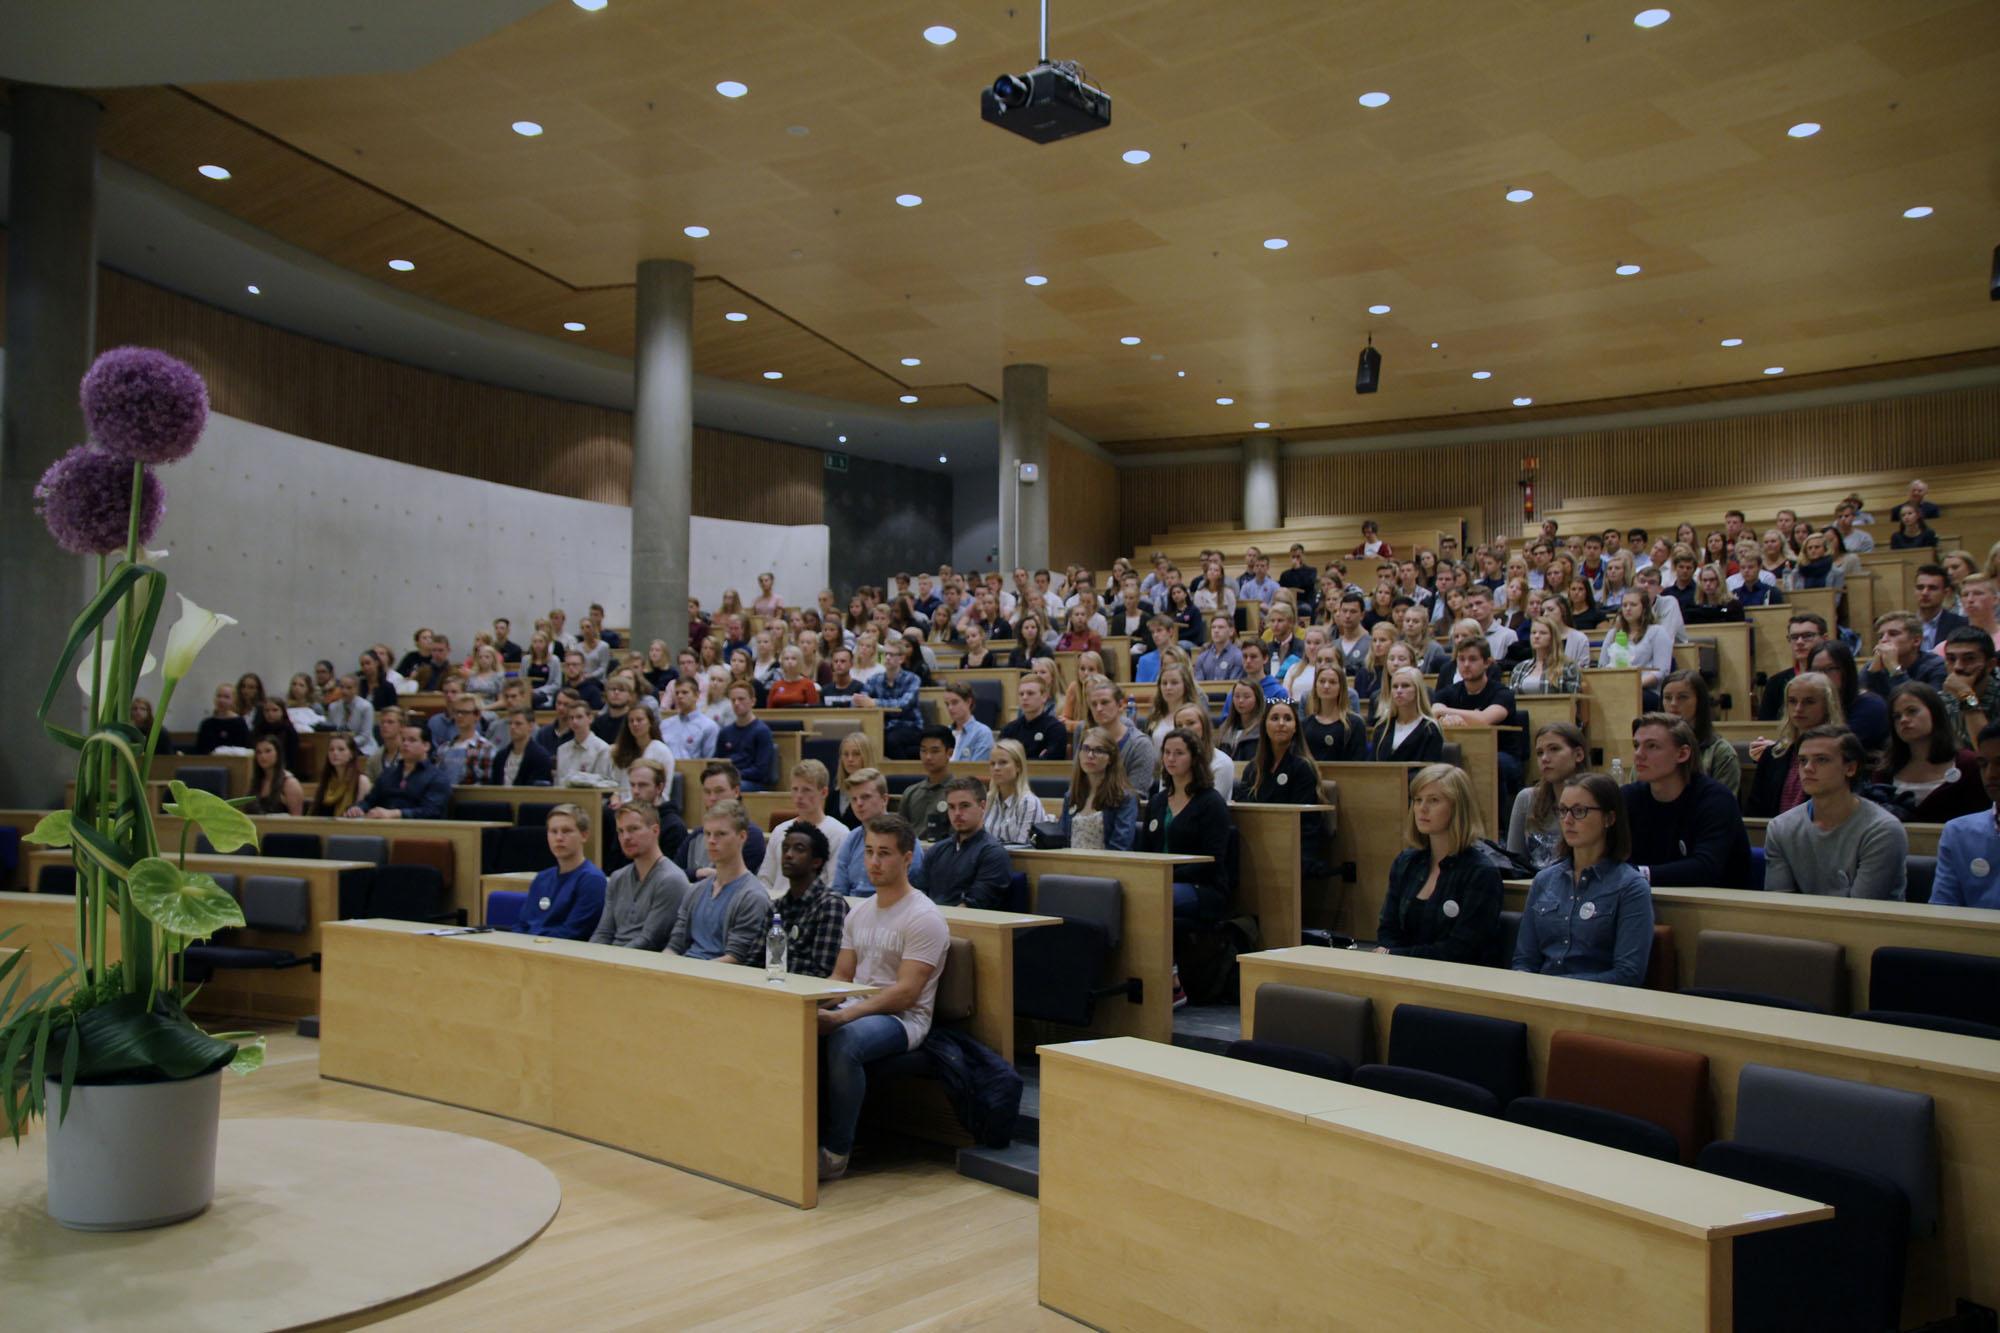 Fullsatt sal under immatrikuleringsseremonien ved fakultetet. Foto: Pernille Feilberg / NTNU